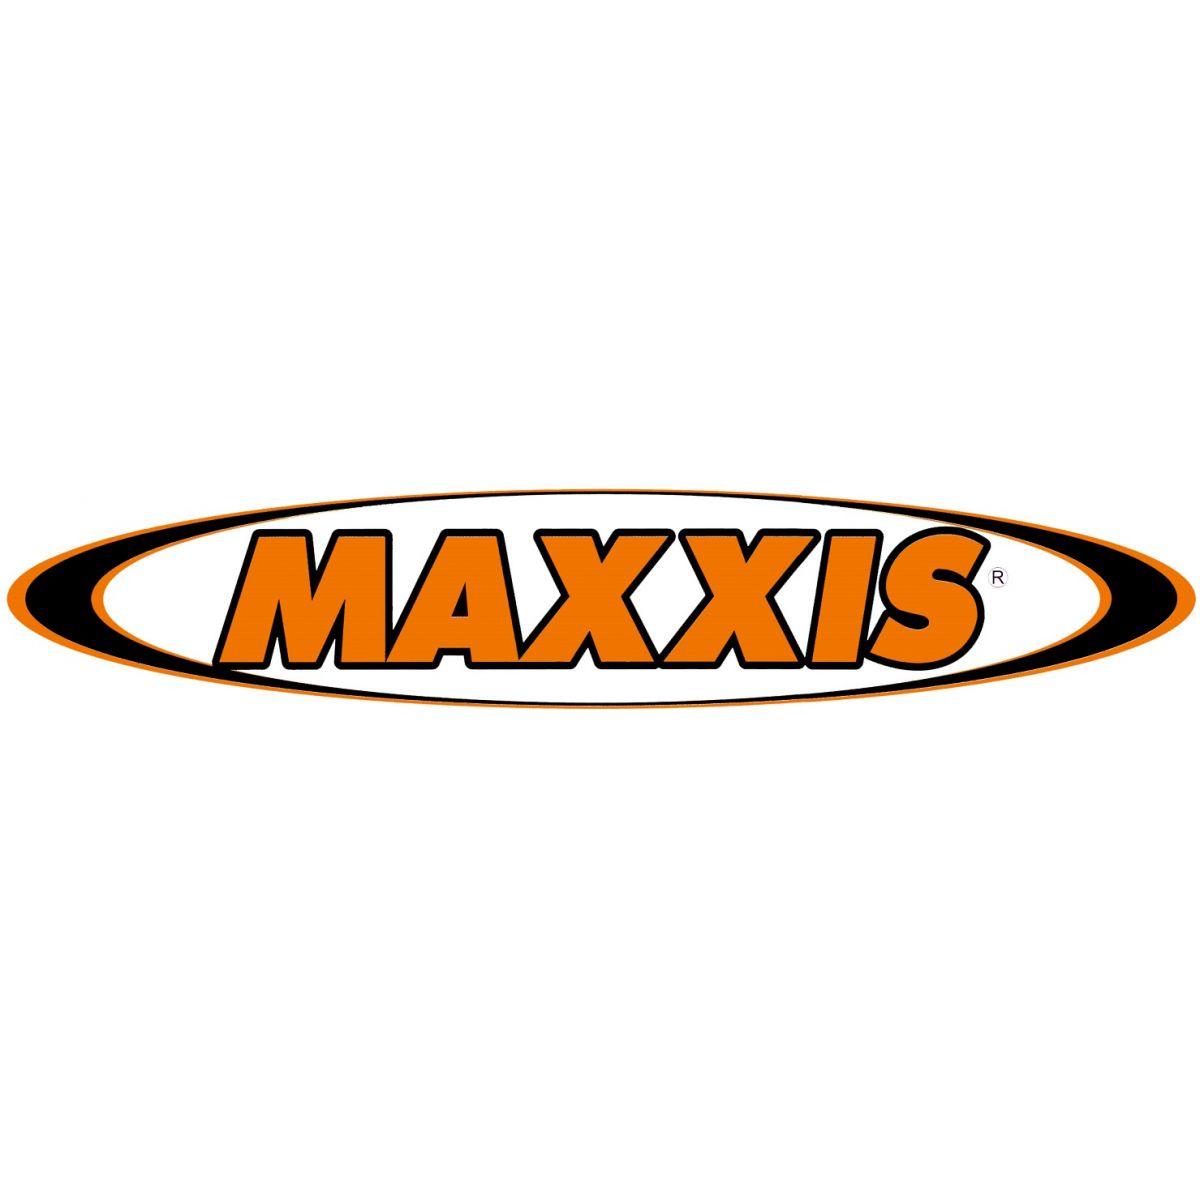 Pneu 300R21 Maxxis Promaxx M6102  Liso 51h Moto (Dianteiro)